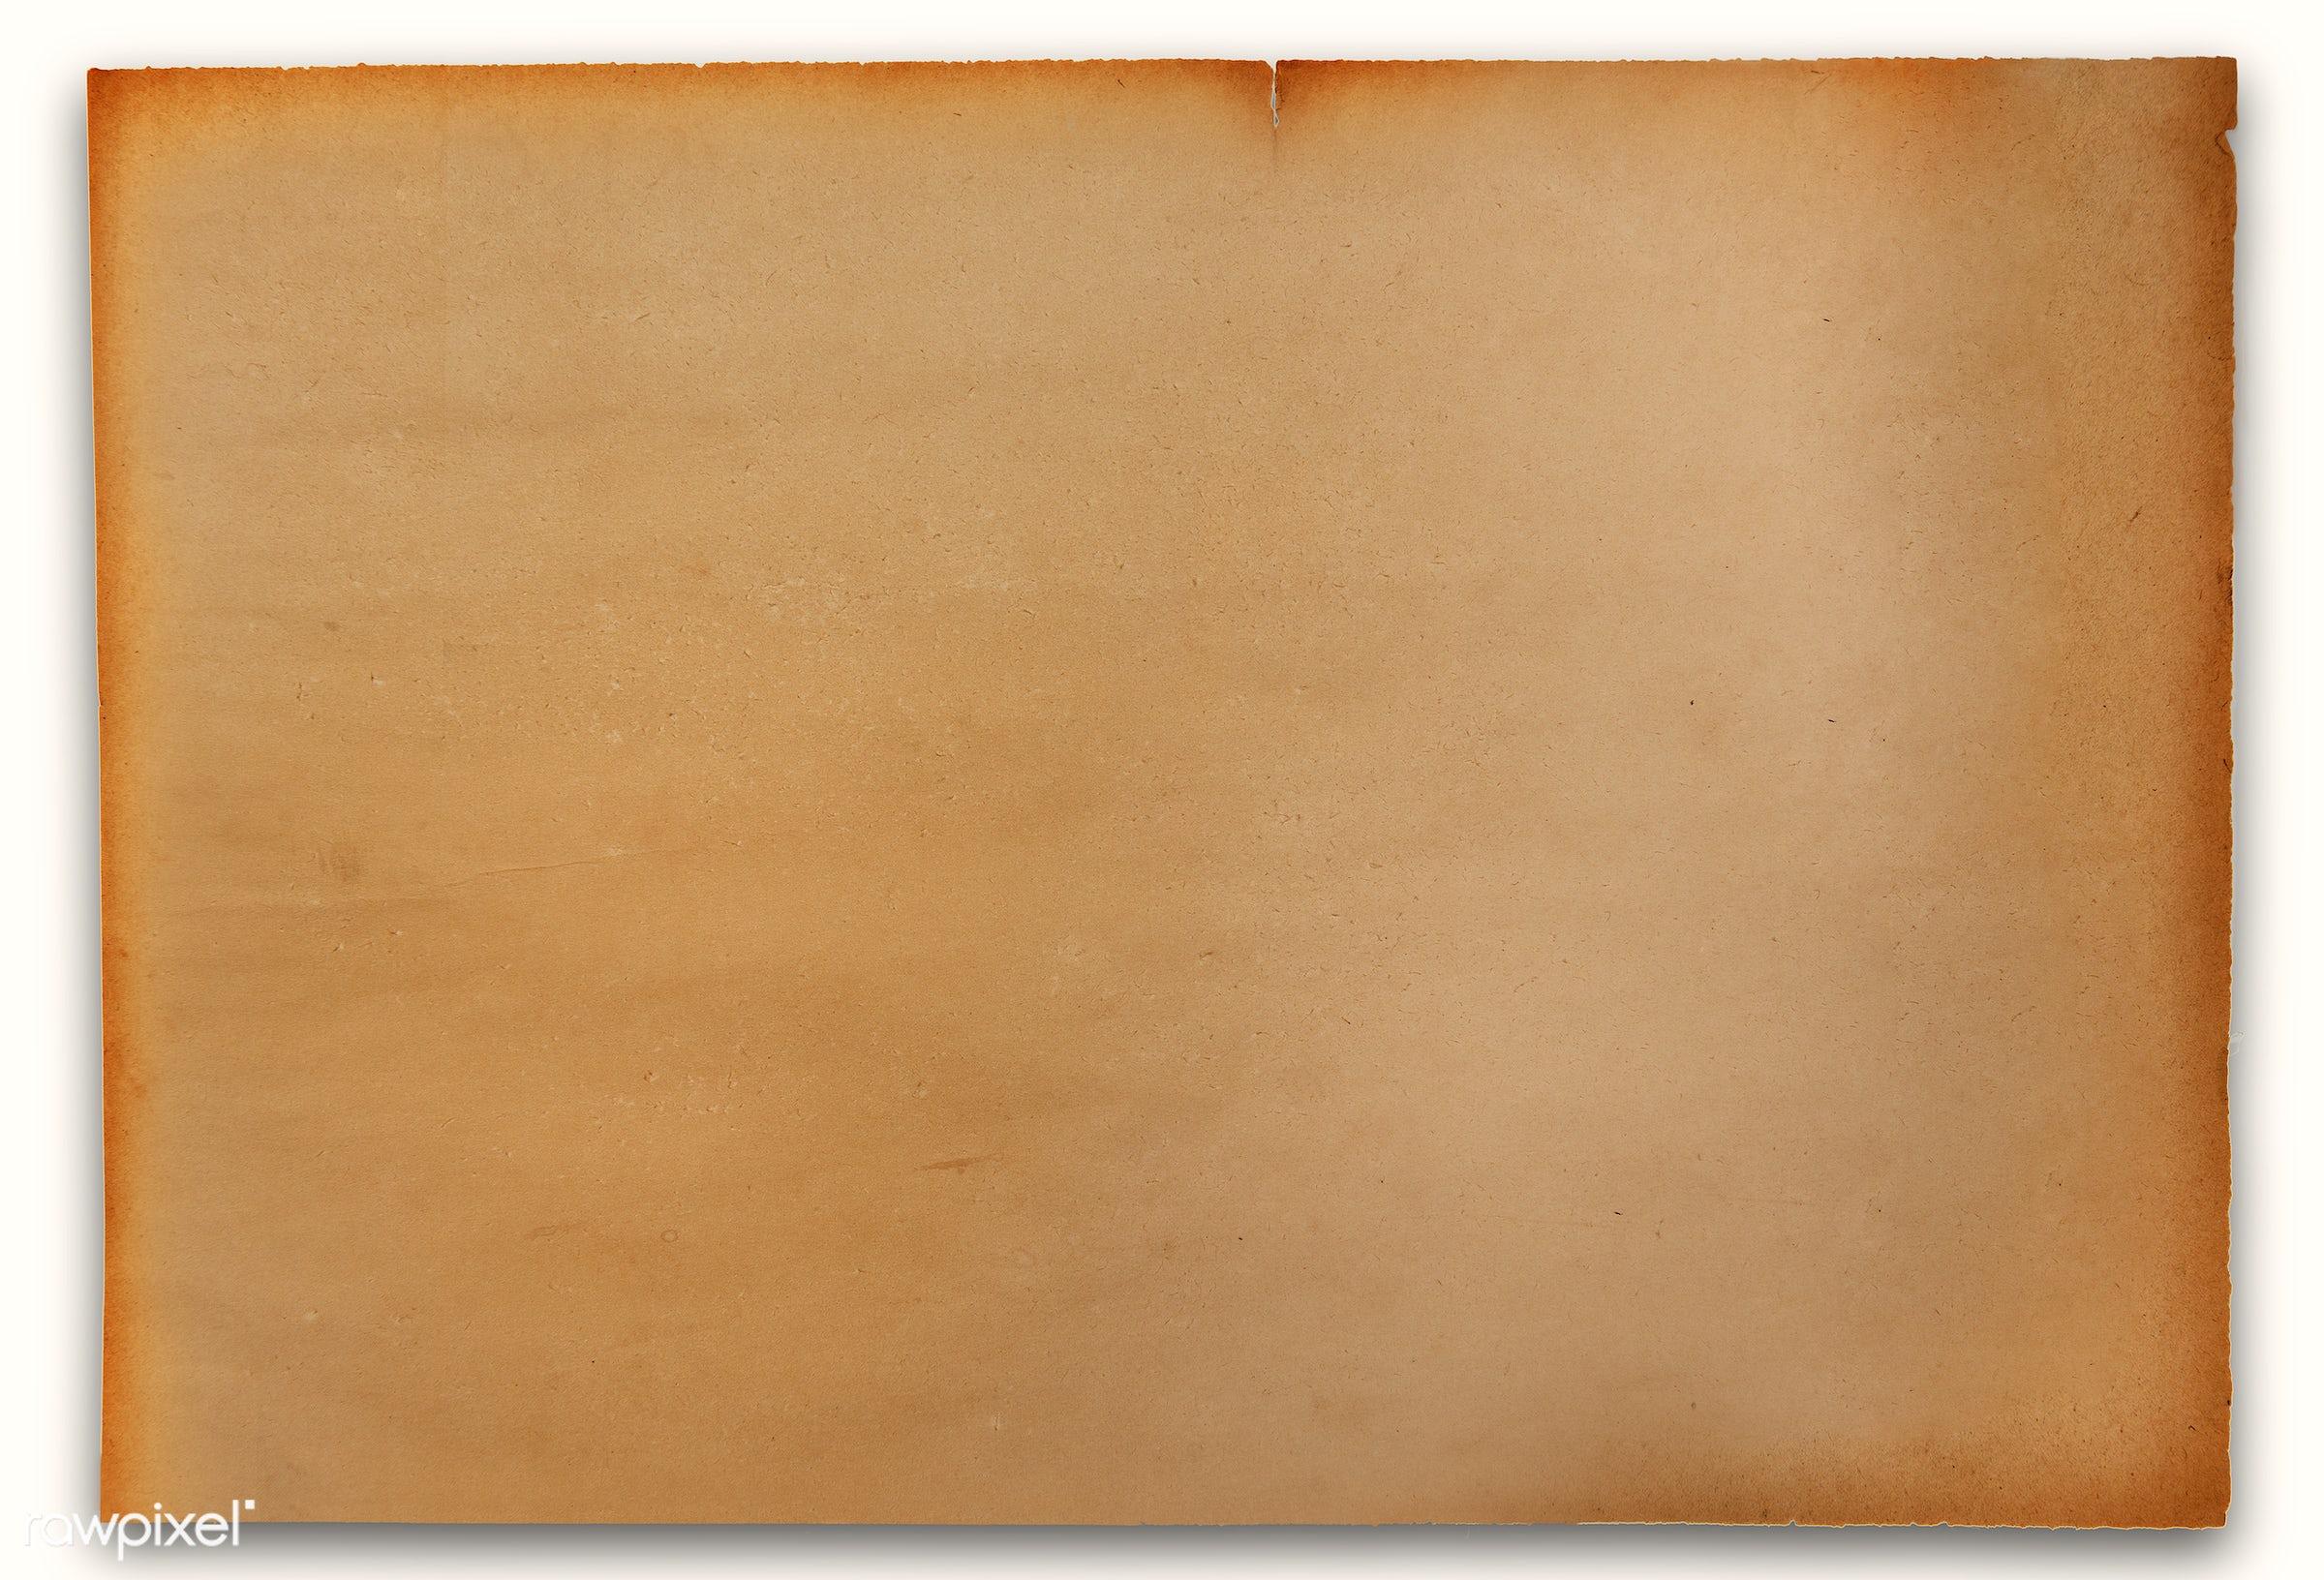 Vintage paper mockup - advert, advertise, announcement, banner, blank, board, brown, card, copy space, copyspace, cork,...